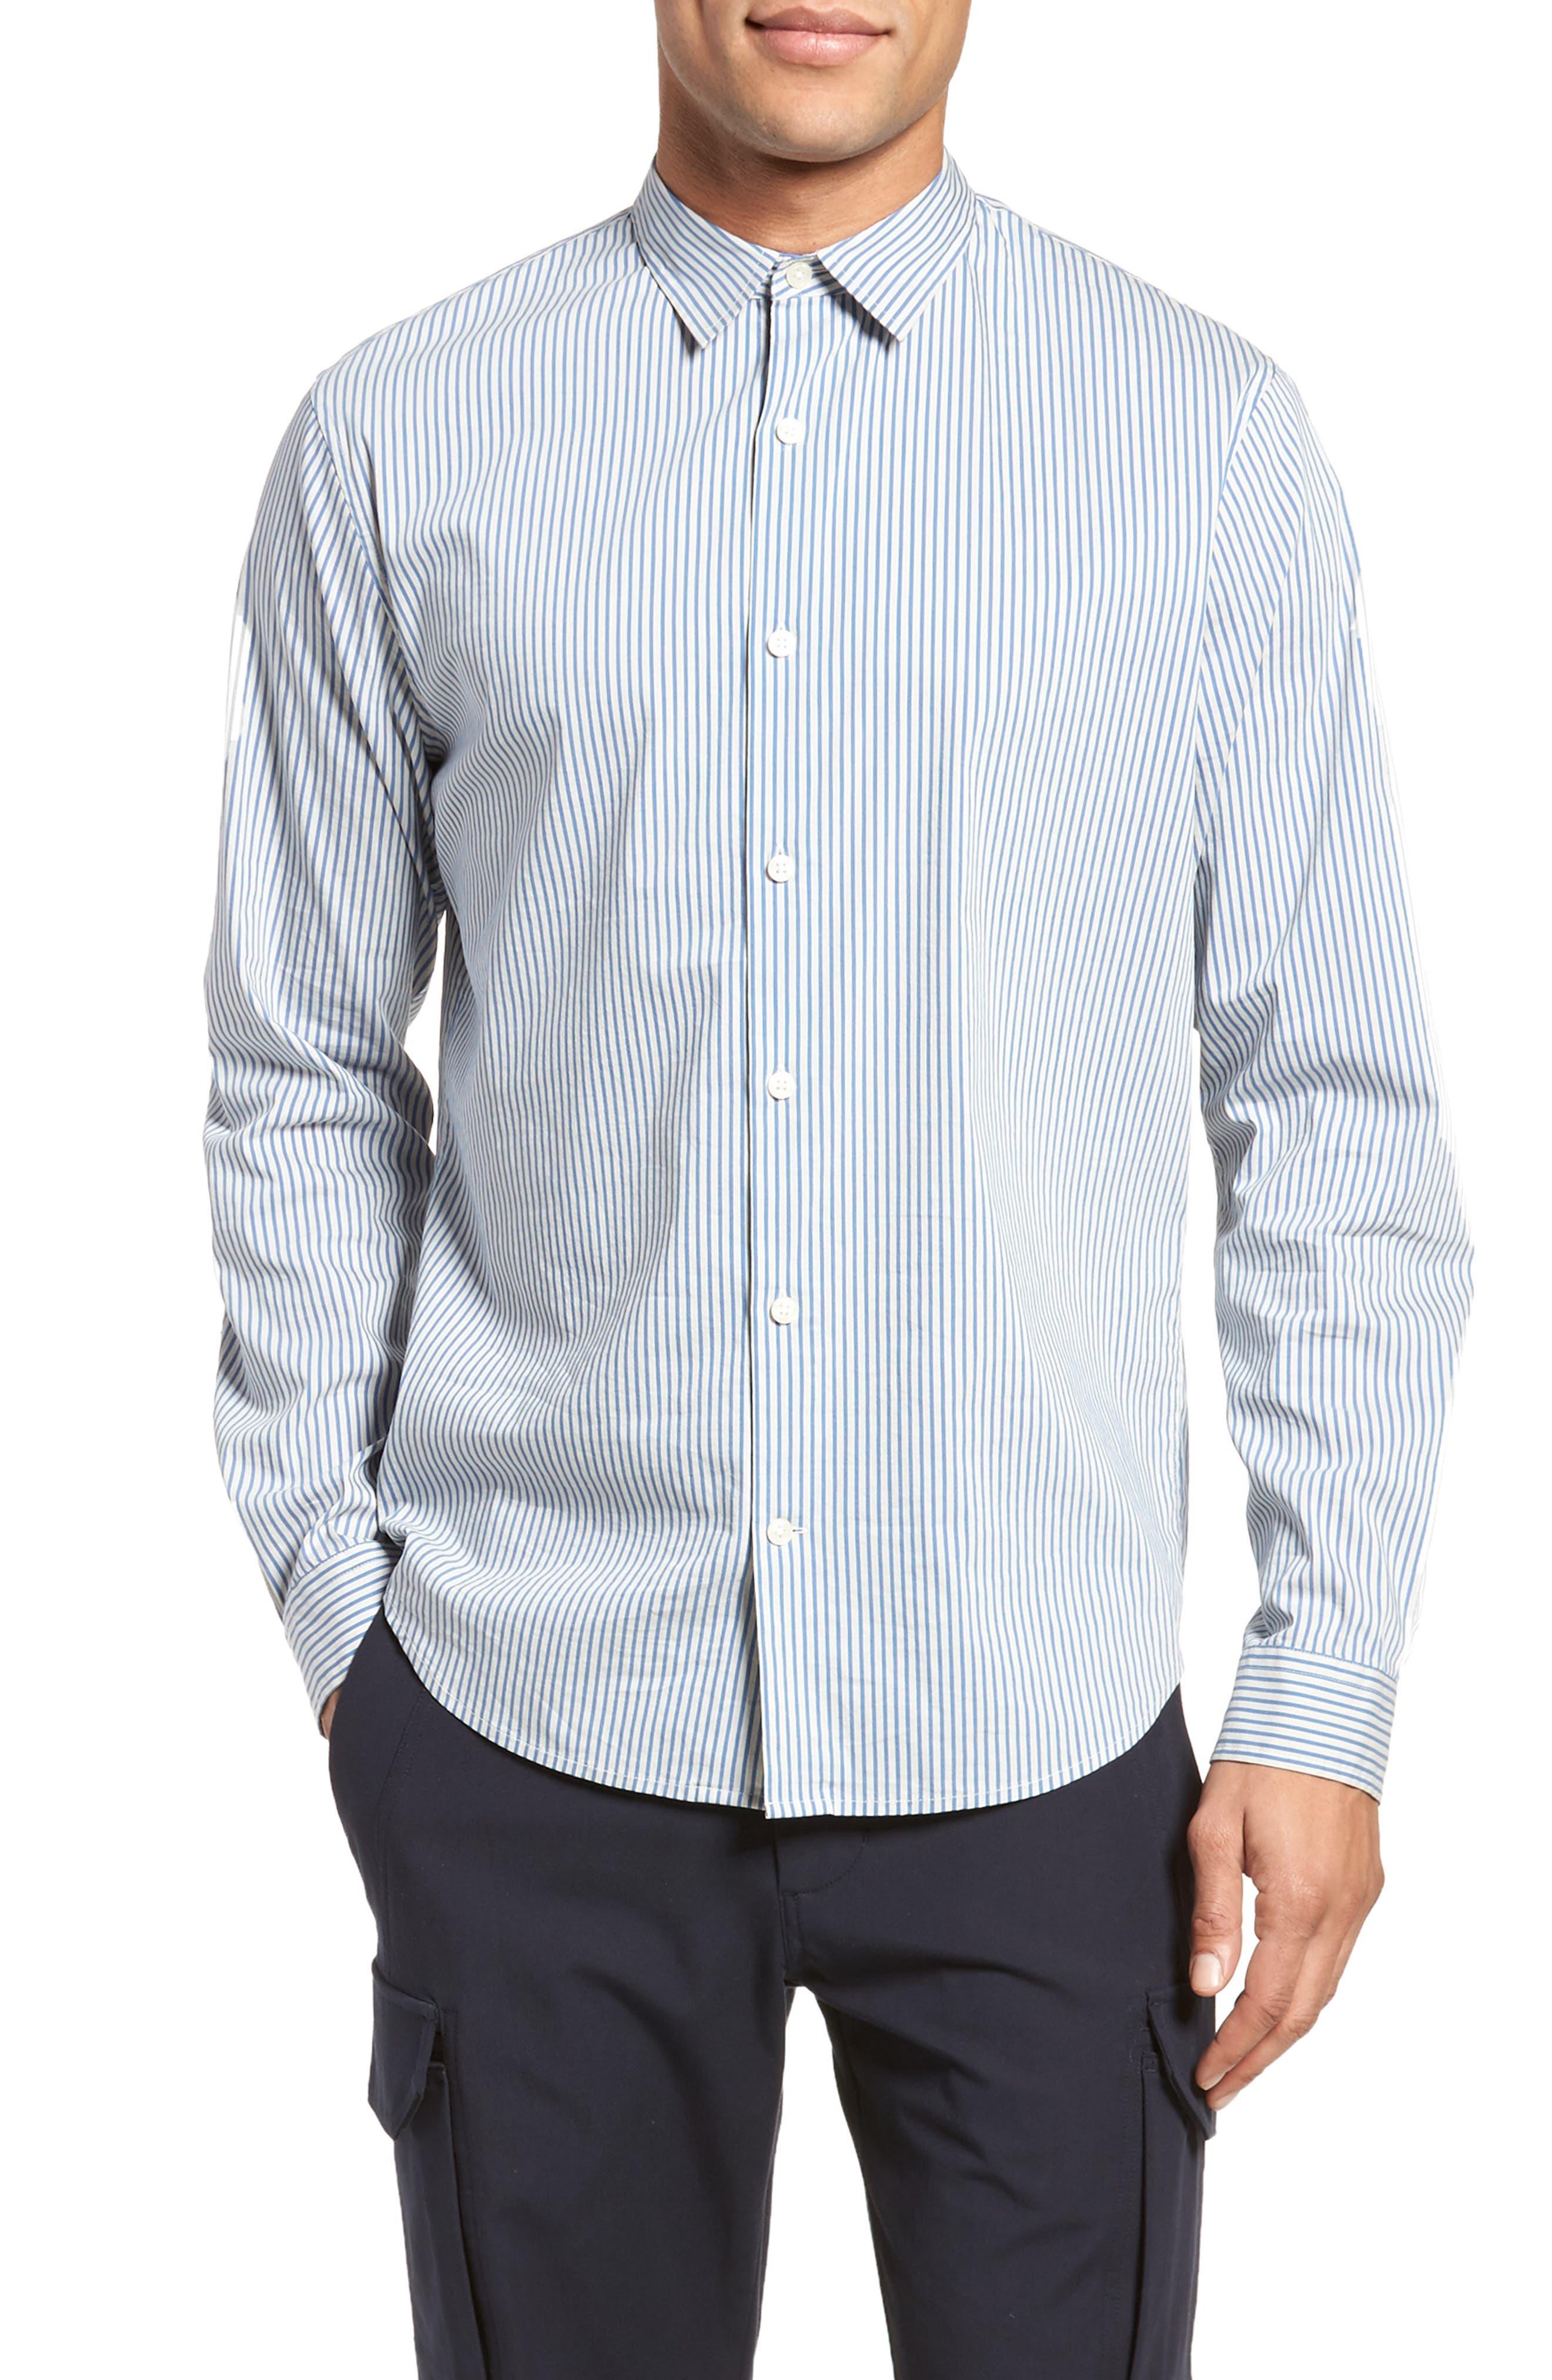 Regular Fit Stripe Sport Shirt,                             Main thumbnail 1, color,                             100